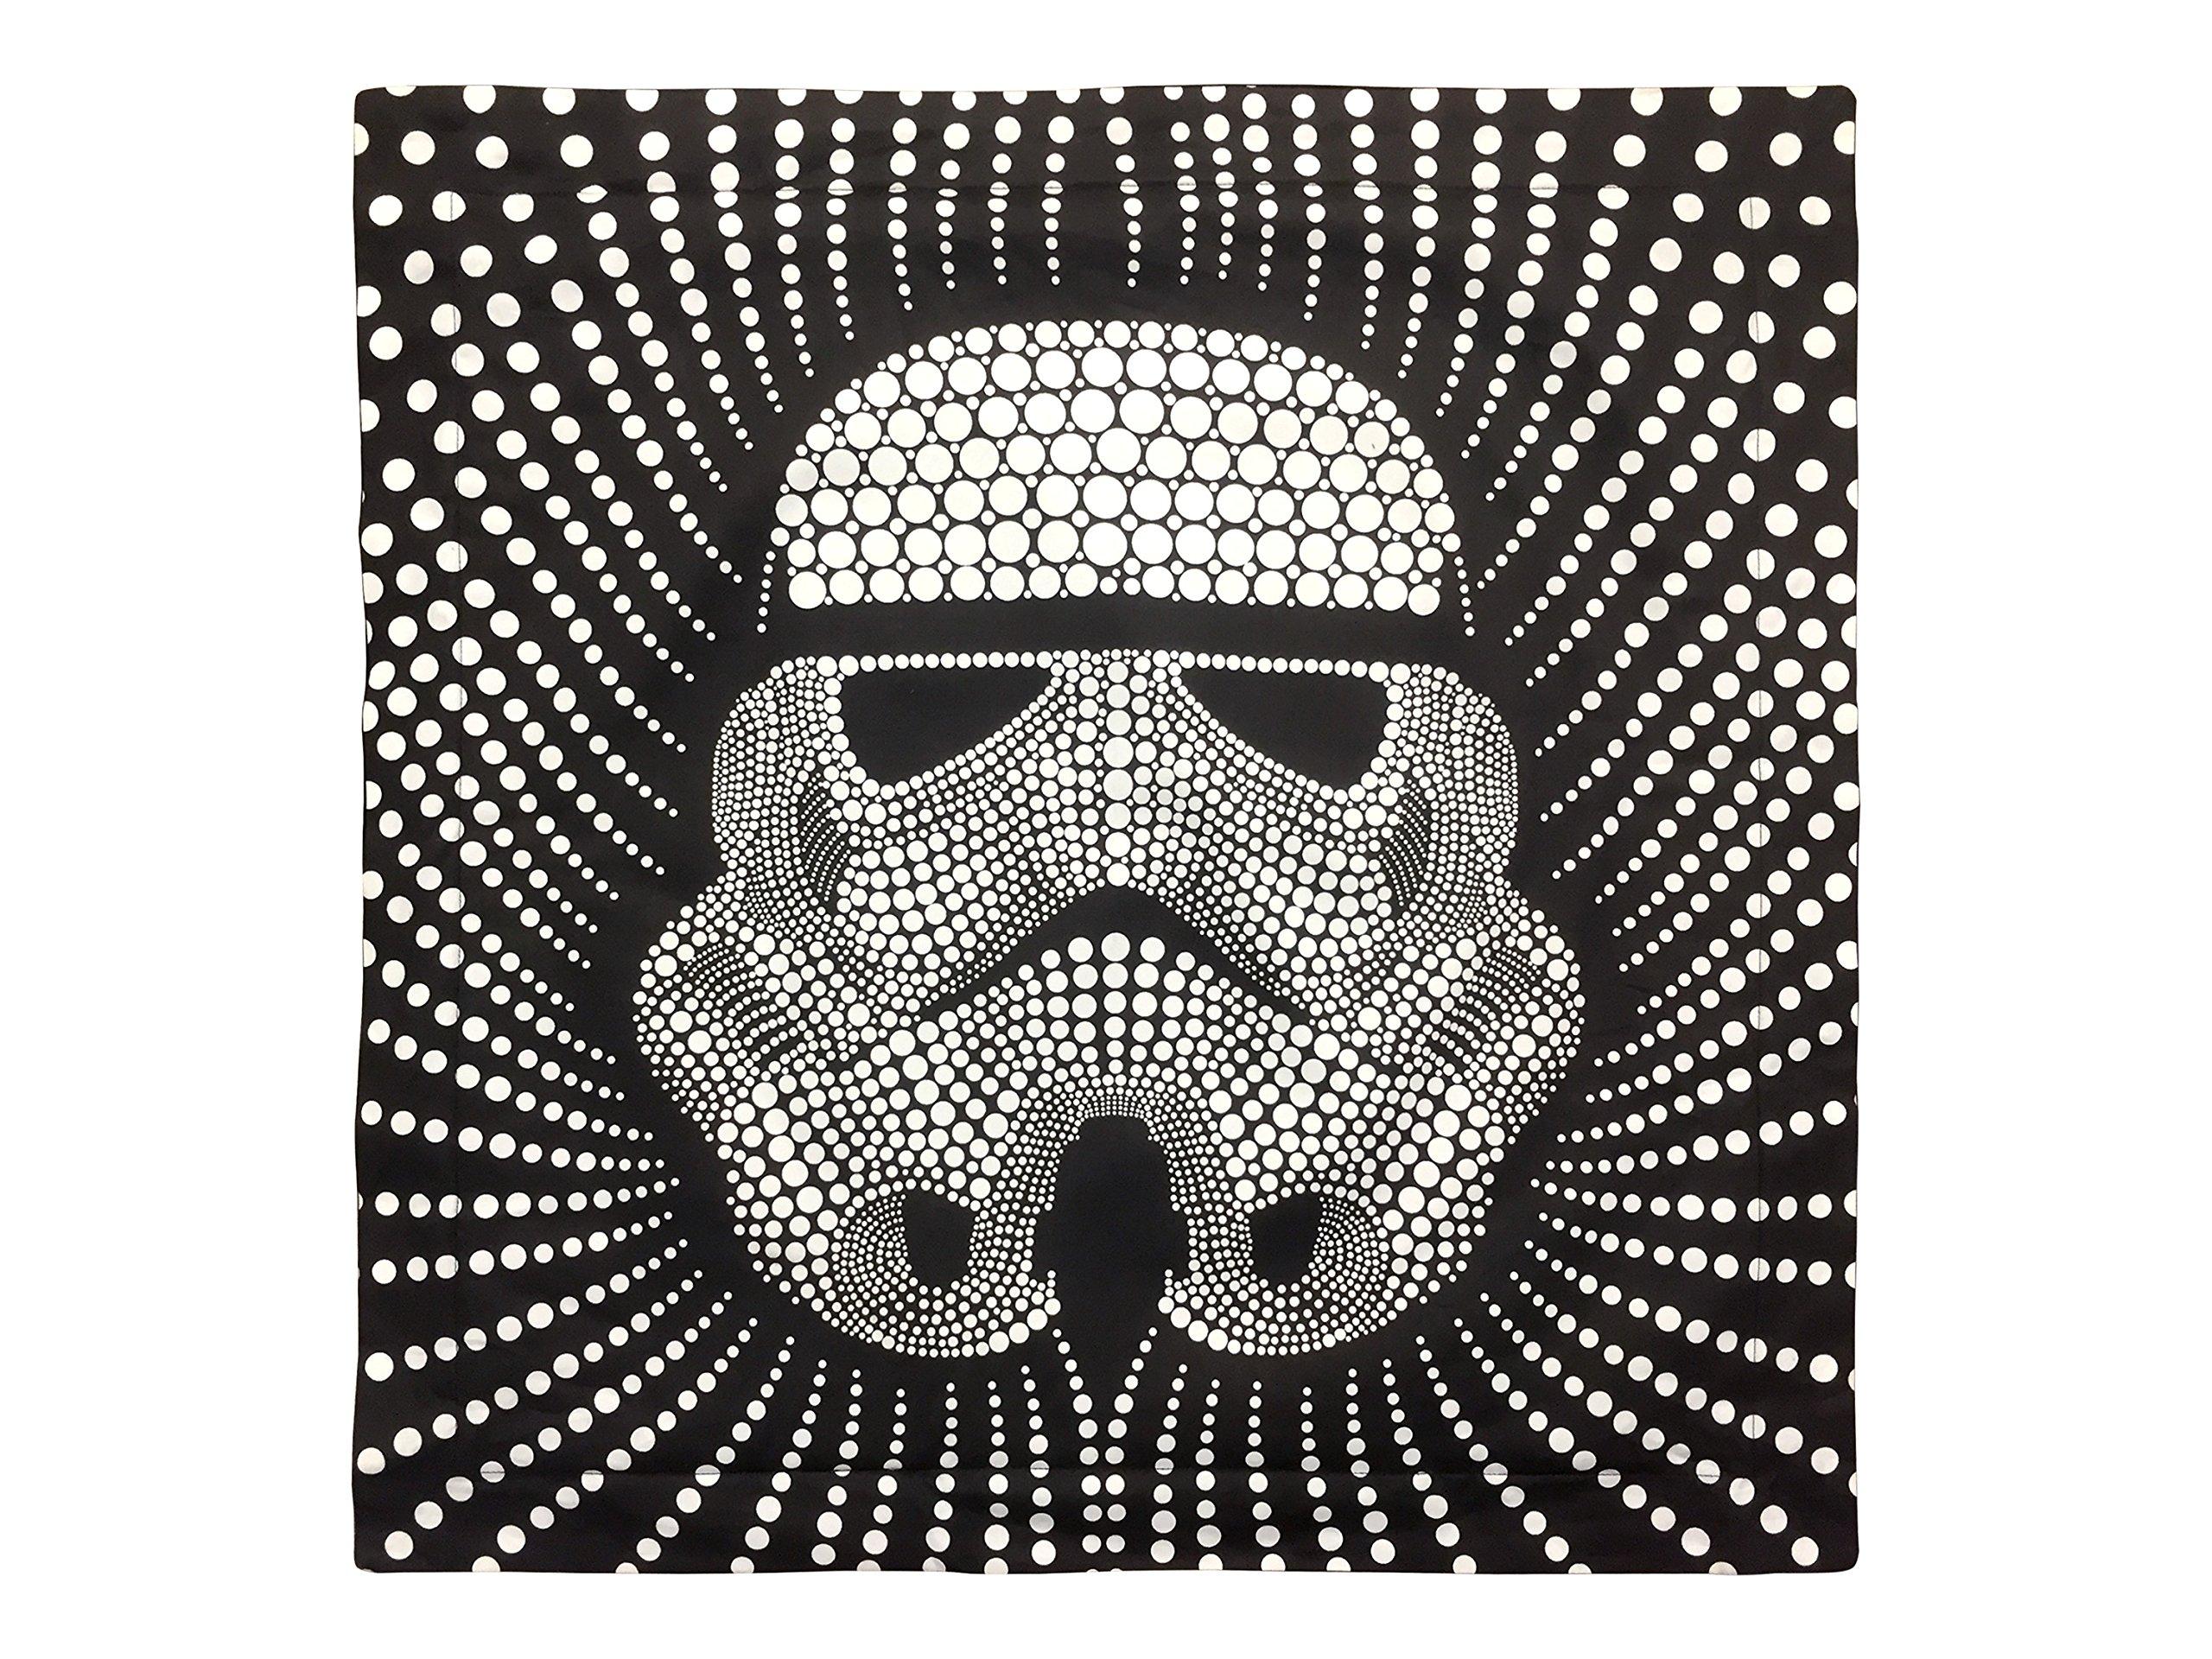 Star Wars Storm Trooper Dots Square 26'' x 26'' Euro Sham with Flange, Black/White